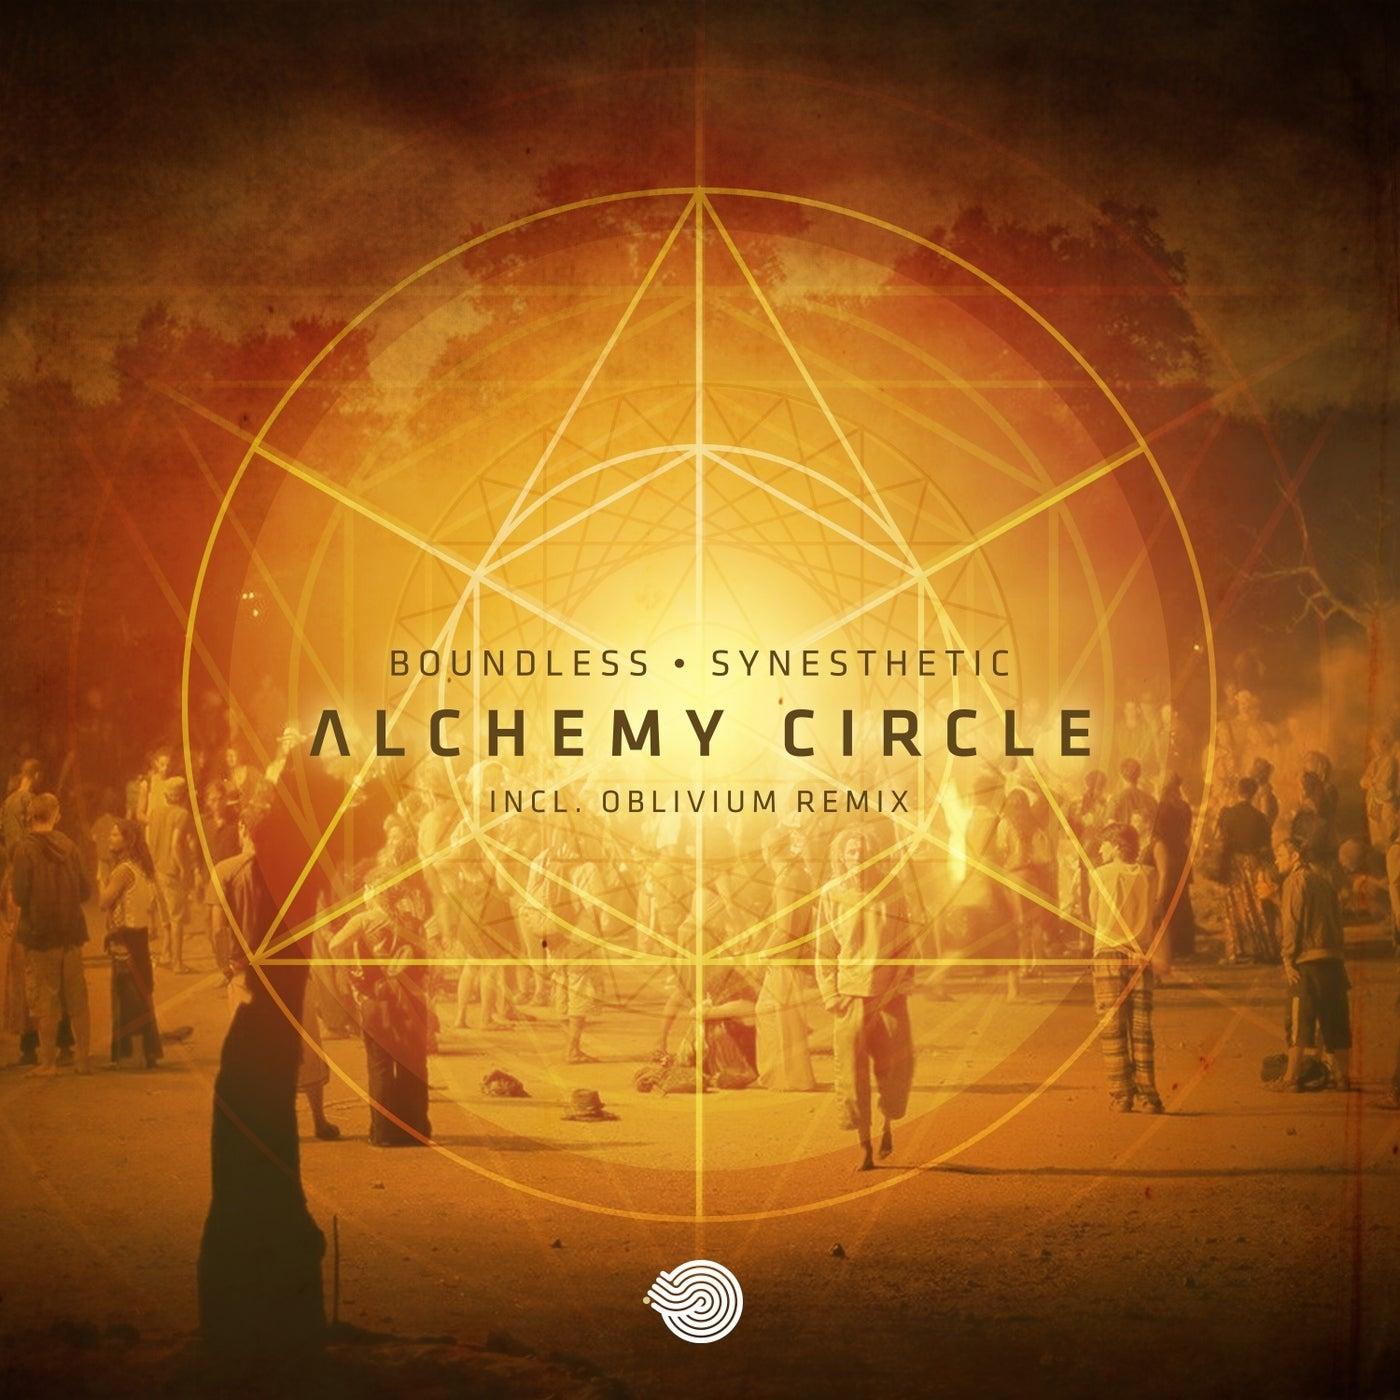 Alchemy Circle (Original mix)